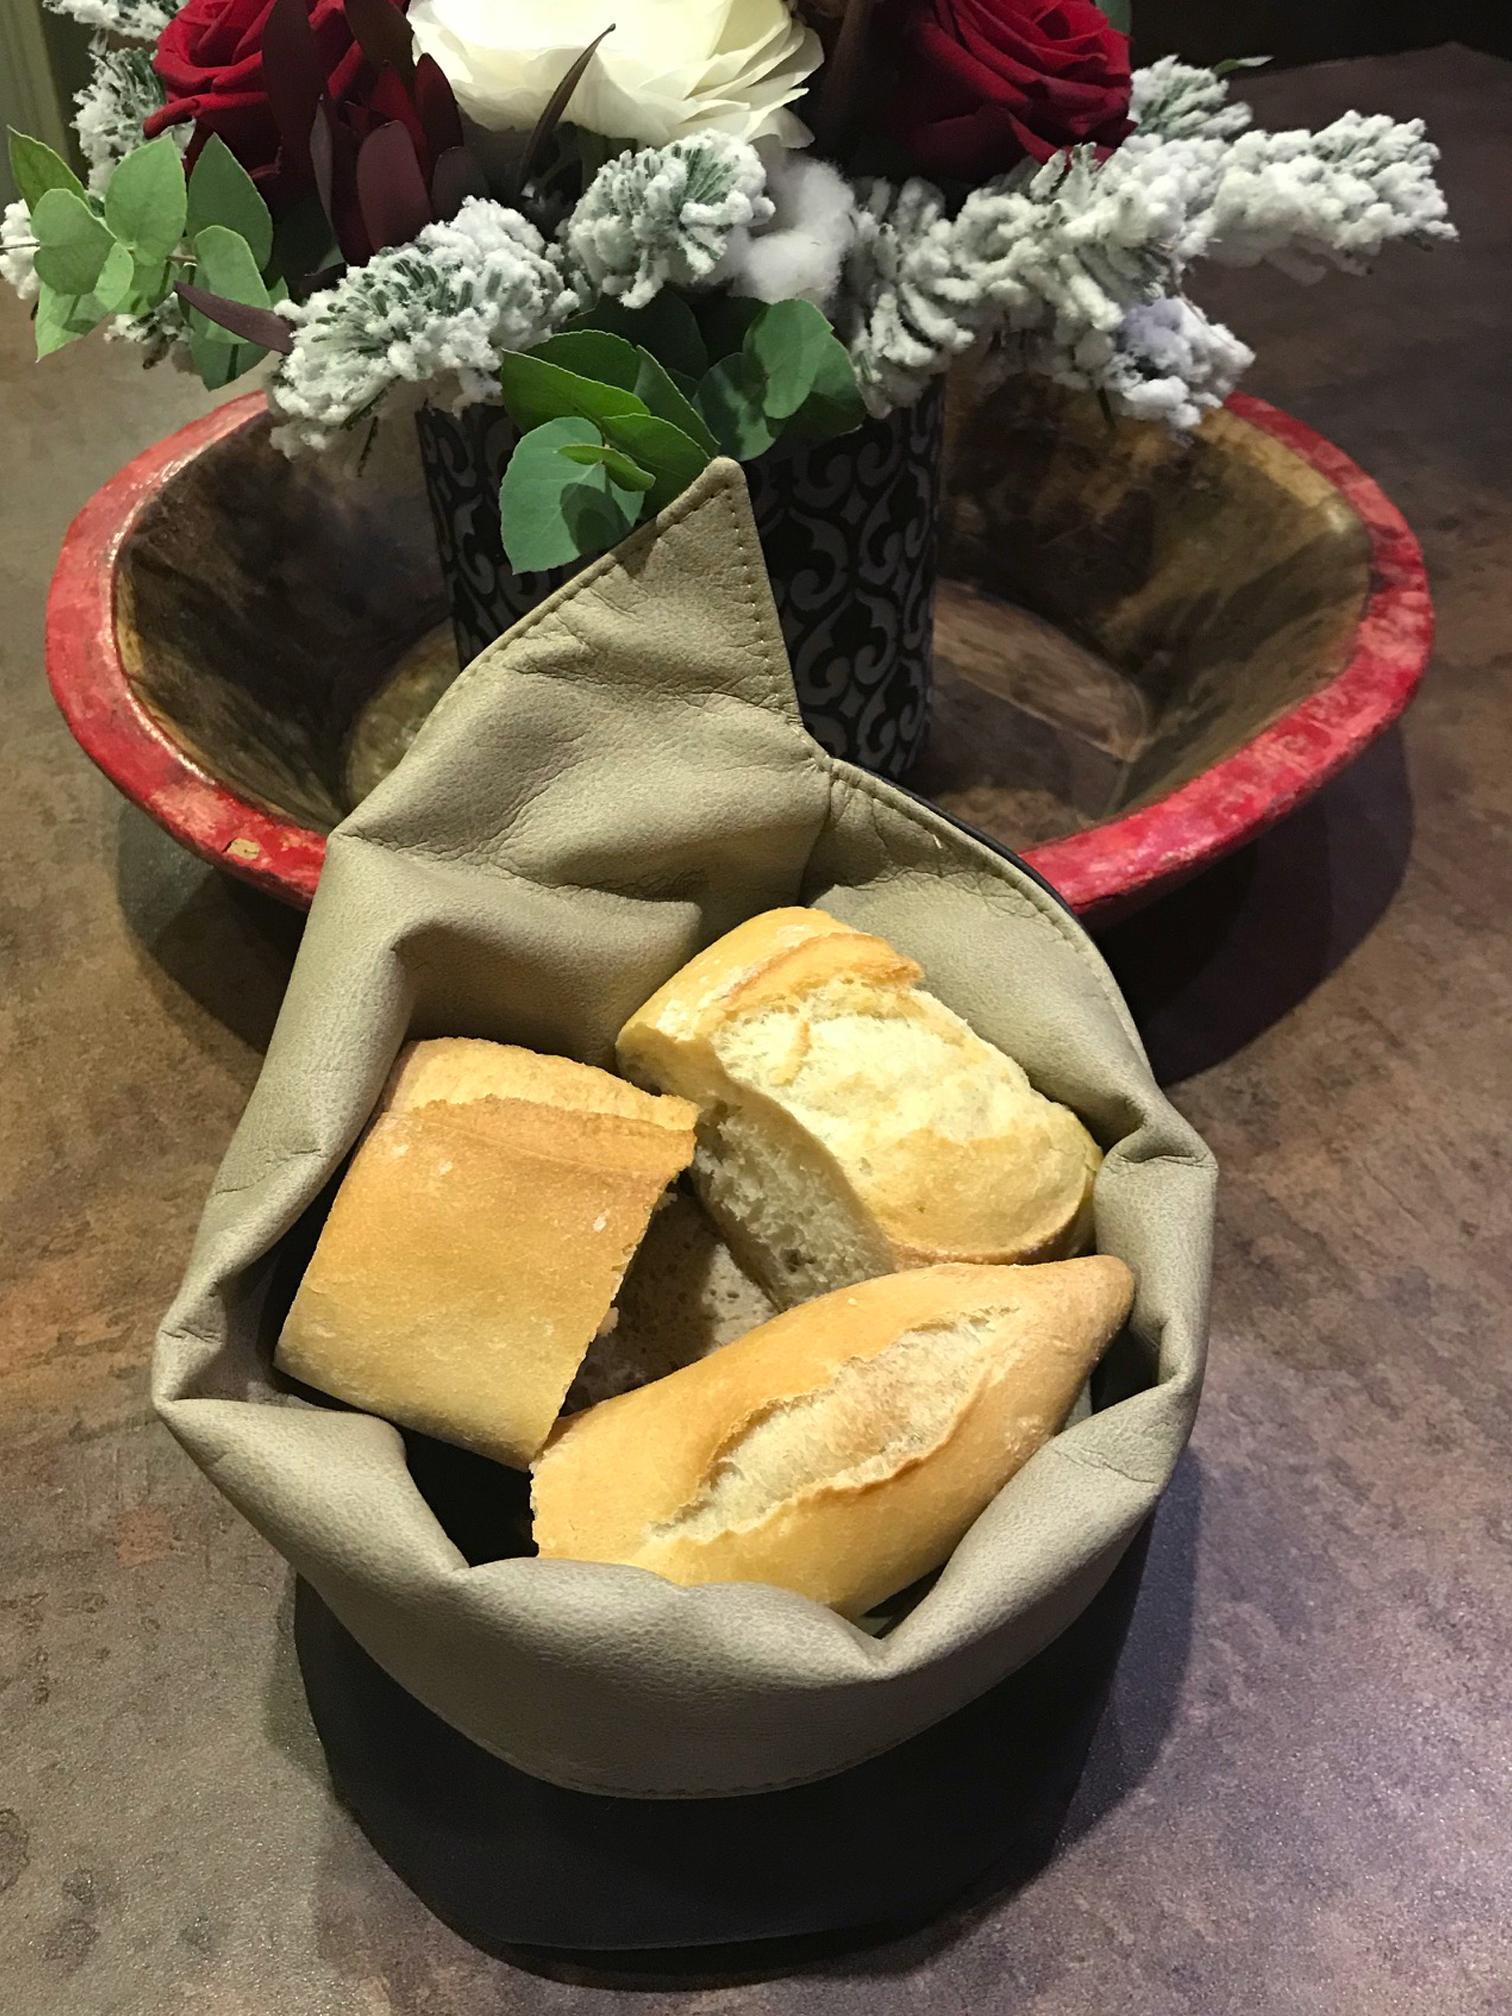 Corbeille à pain cuir restaurant